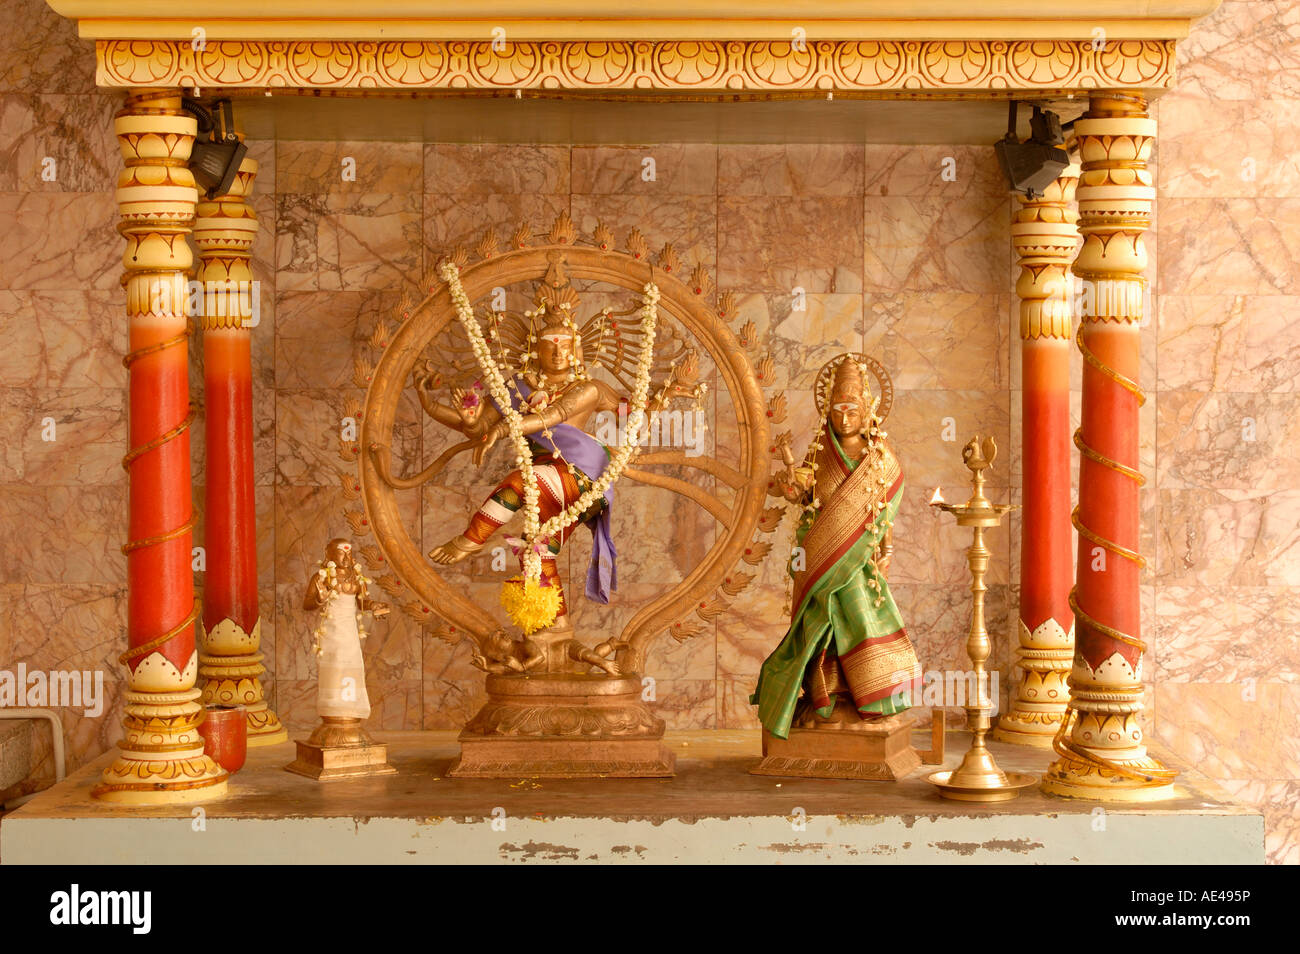 Shrine with Hindu deity, a dancing Shiva, at Sri Maha Mariamman Temple, Kuala Lumpur, Malaysia, Southeast Asia, - Stock Image